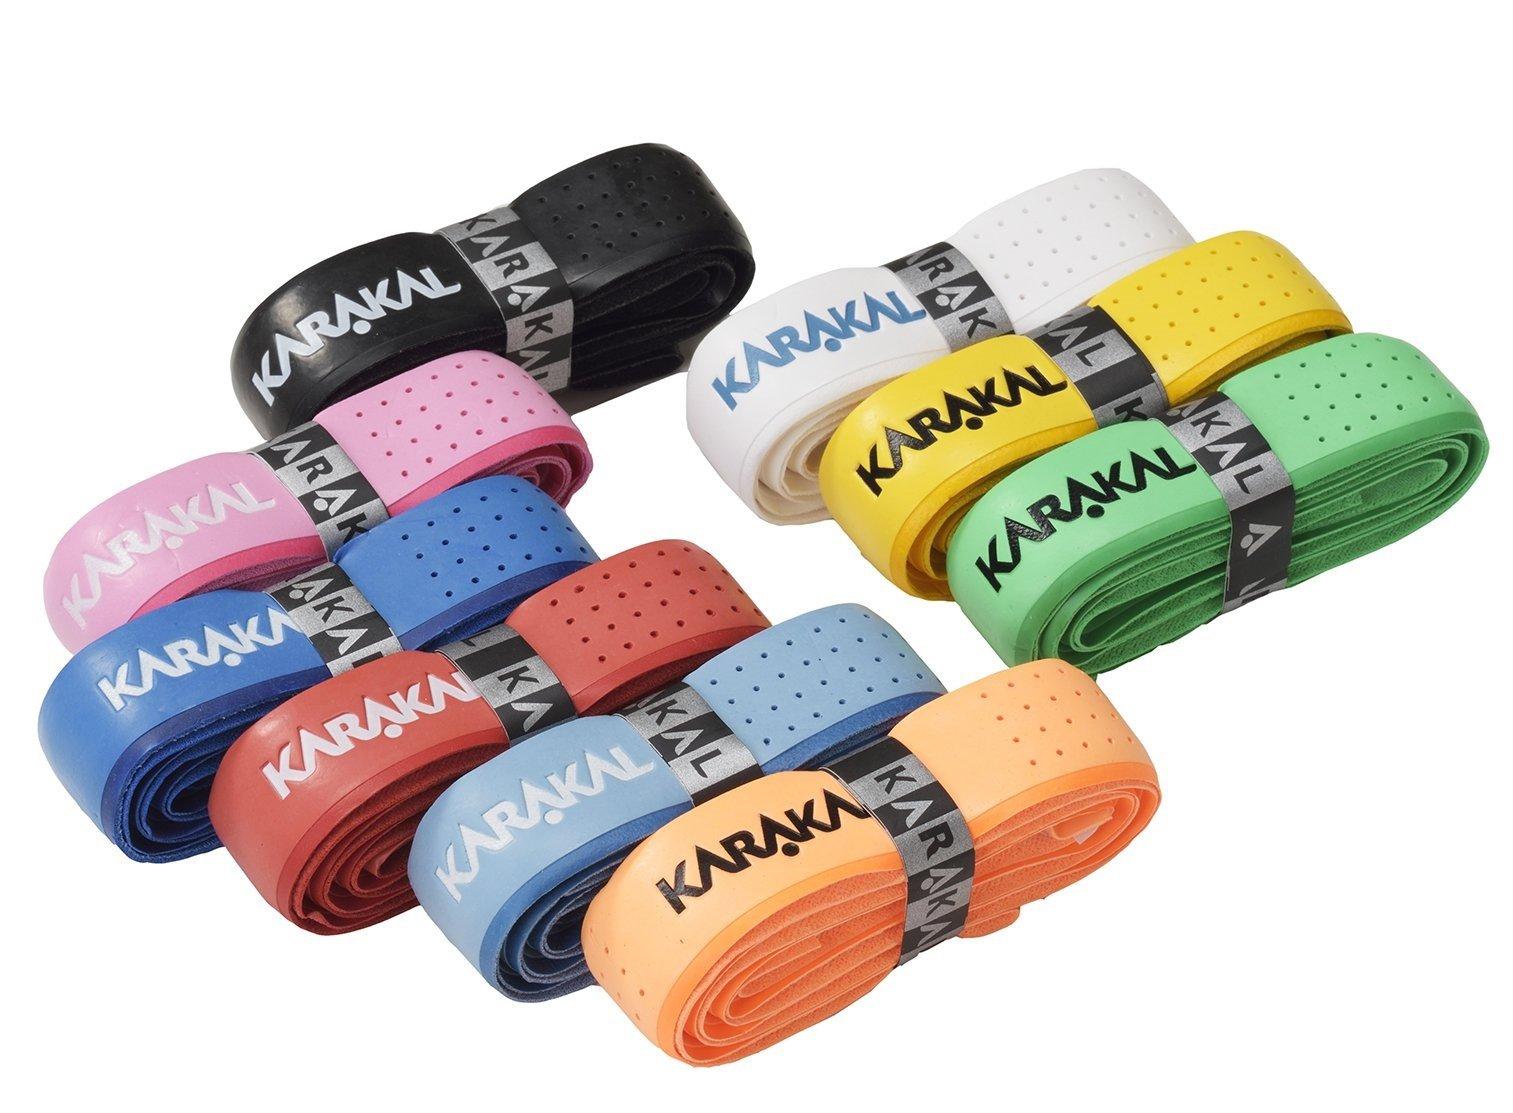 Karakal PU Super Tribal Grip Box 12 Replacement Grip-Assorted Colors